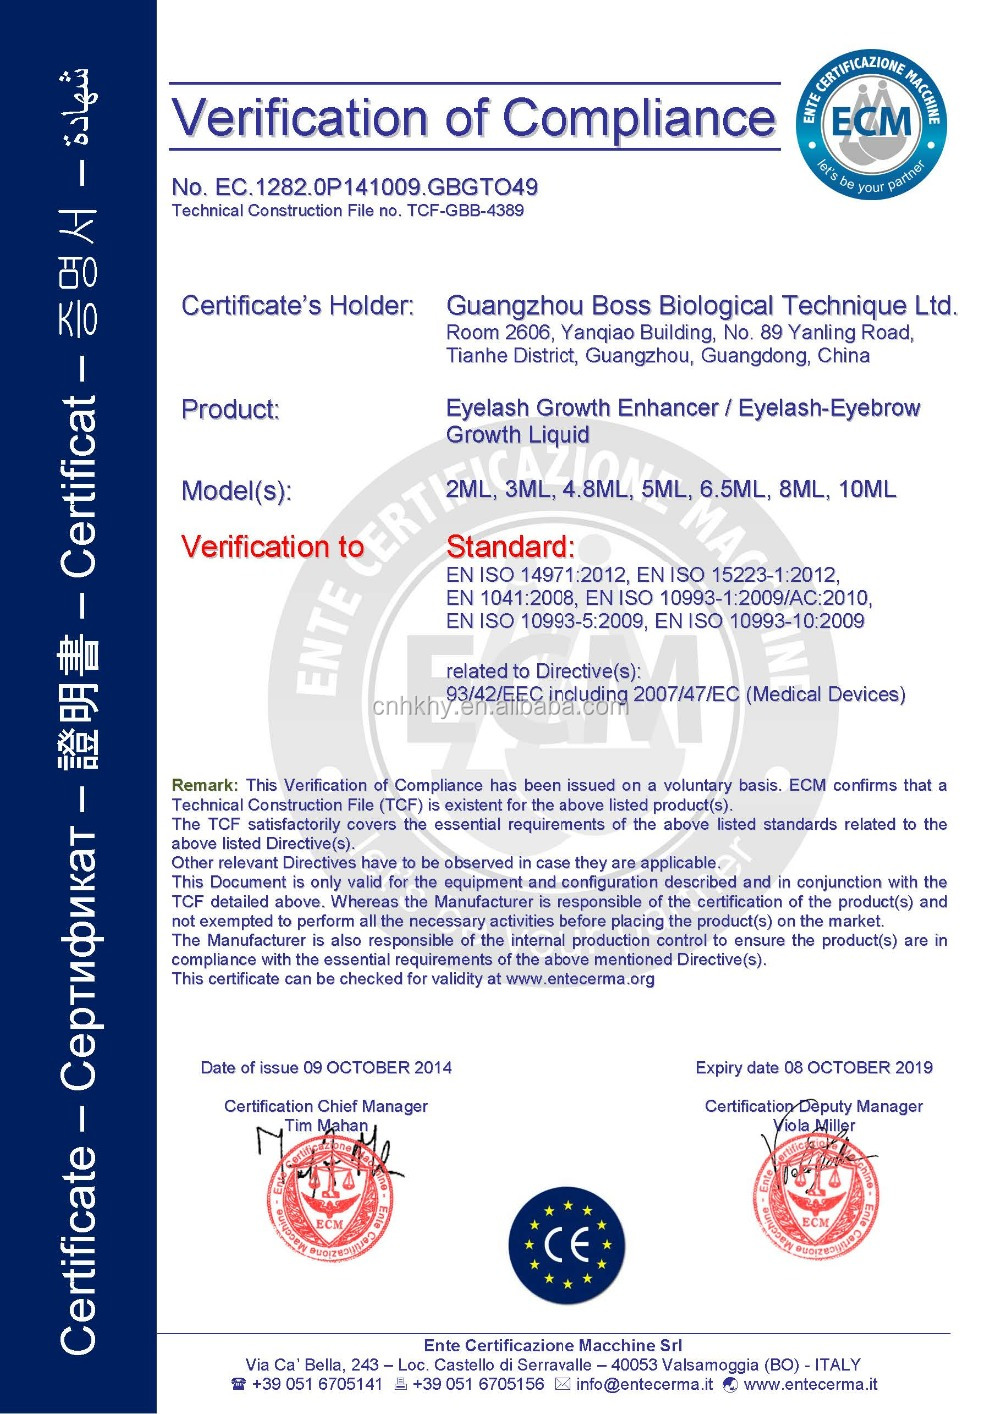 Eyelash-brow growth liquid CE Certificate.jpg